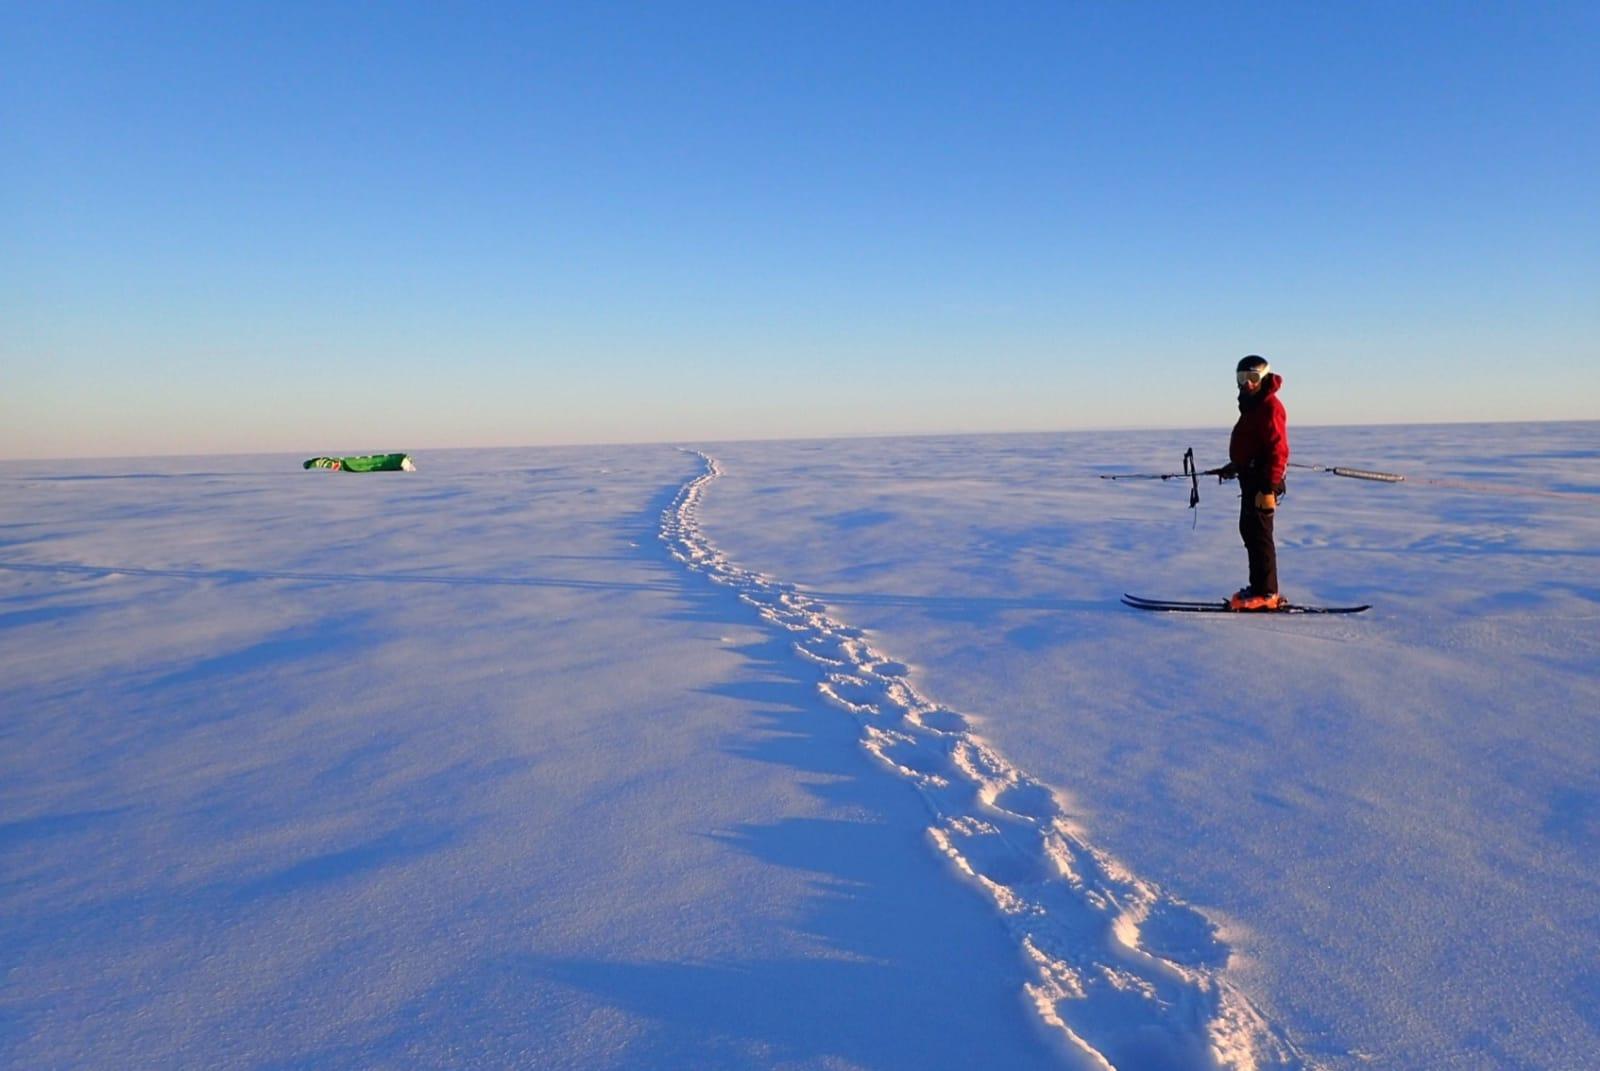 UVENTET SYN: Spor av isbjørn. Foto: Ronny Finsås